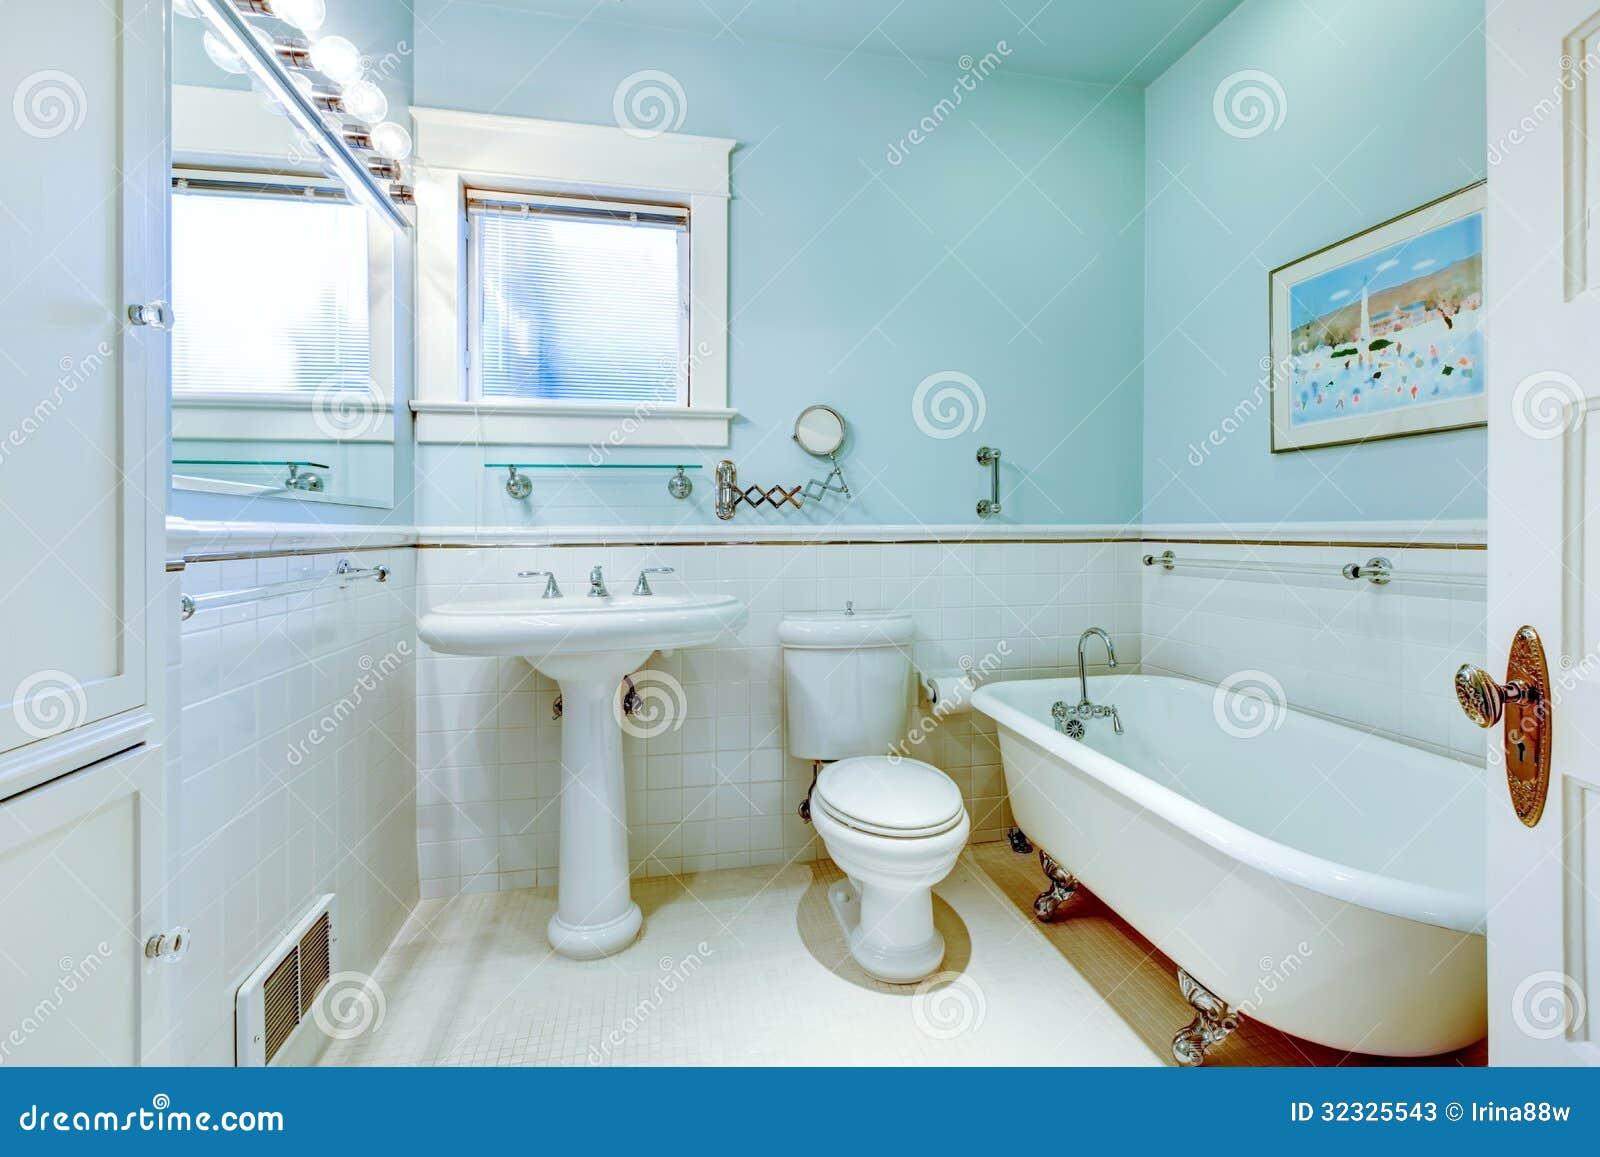 Cuarto de ba o elegante antiguo azul con la tina blanca - Banos antiguos fotos ...